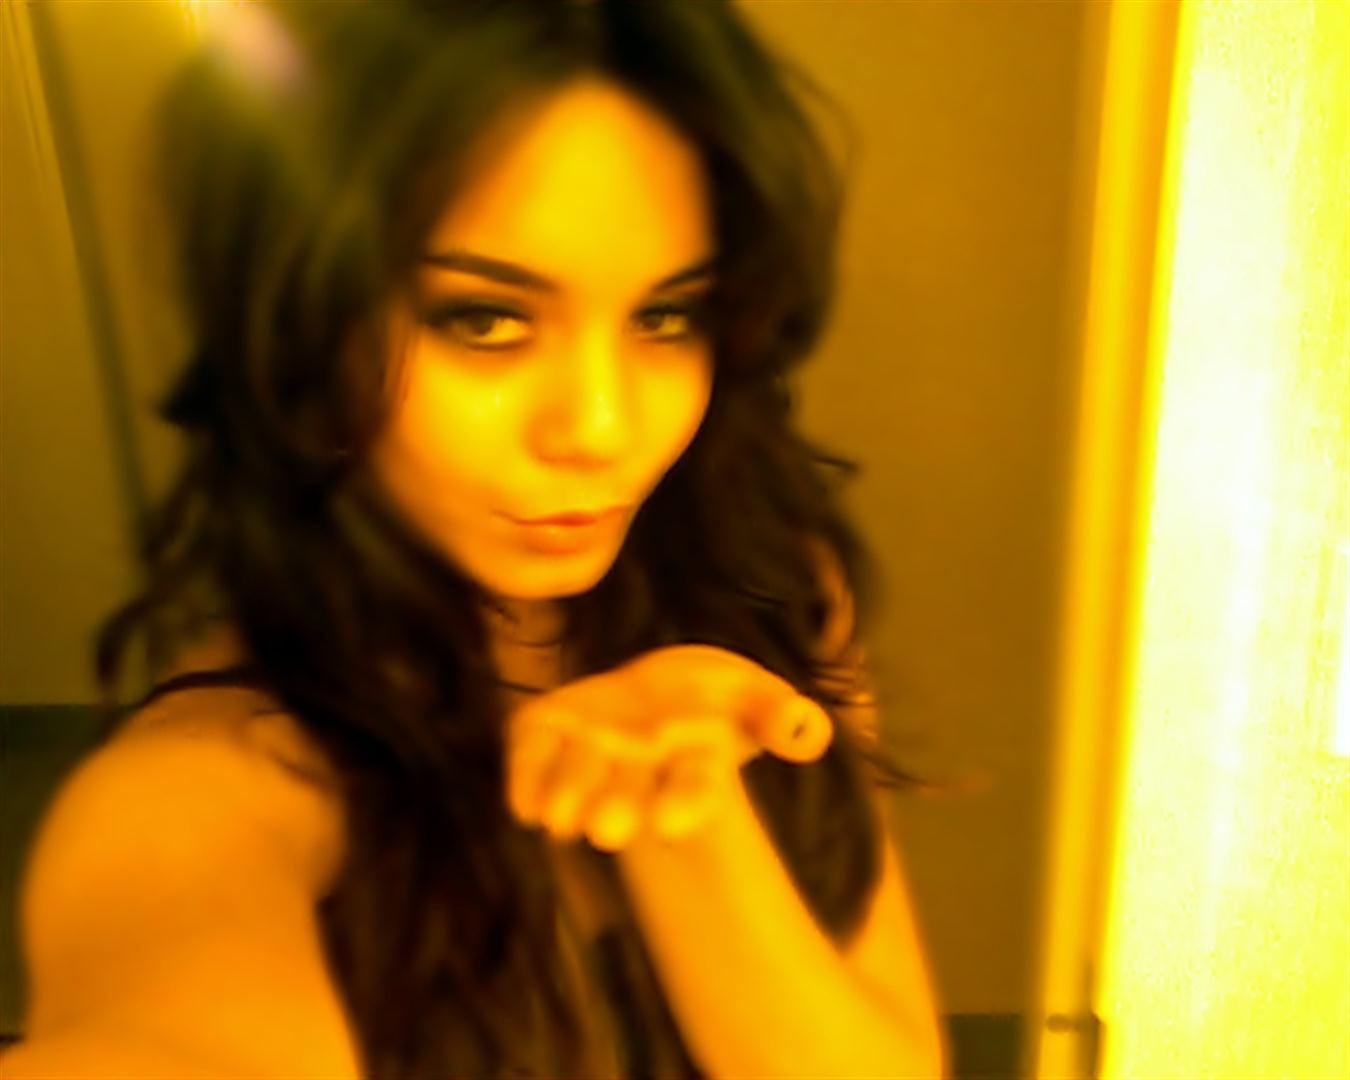 Vanessa hudgens private pictures Vanessa Hudgens nude, topless pictures, playboy